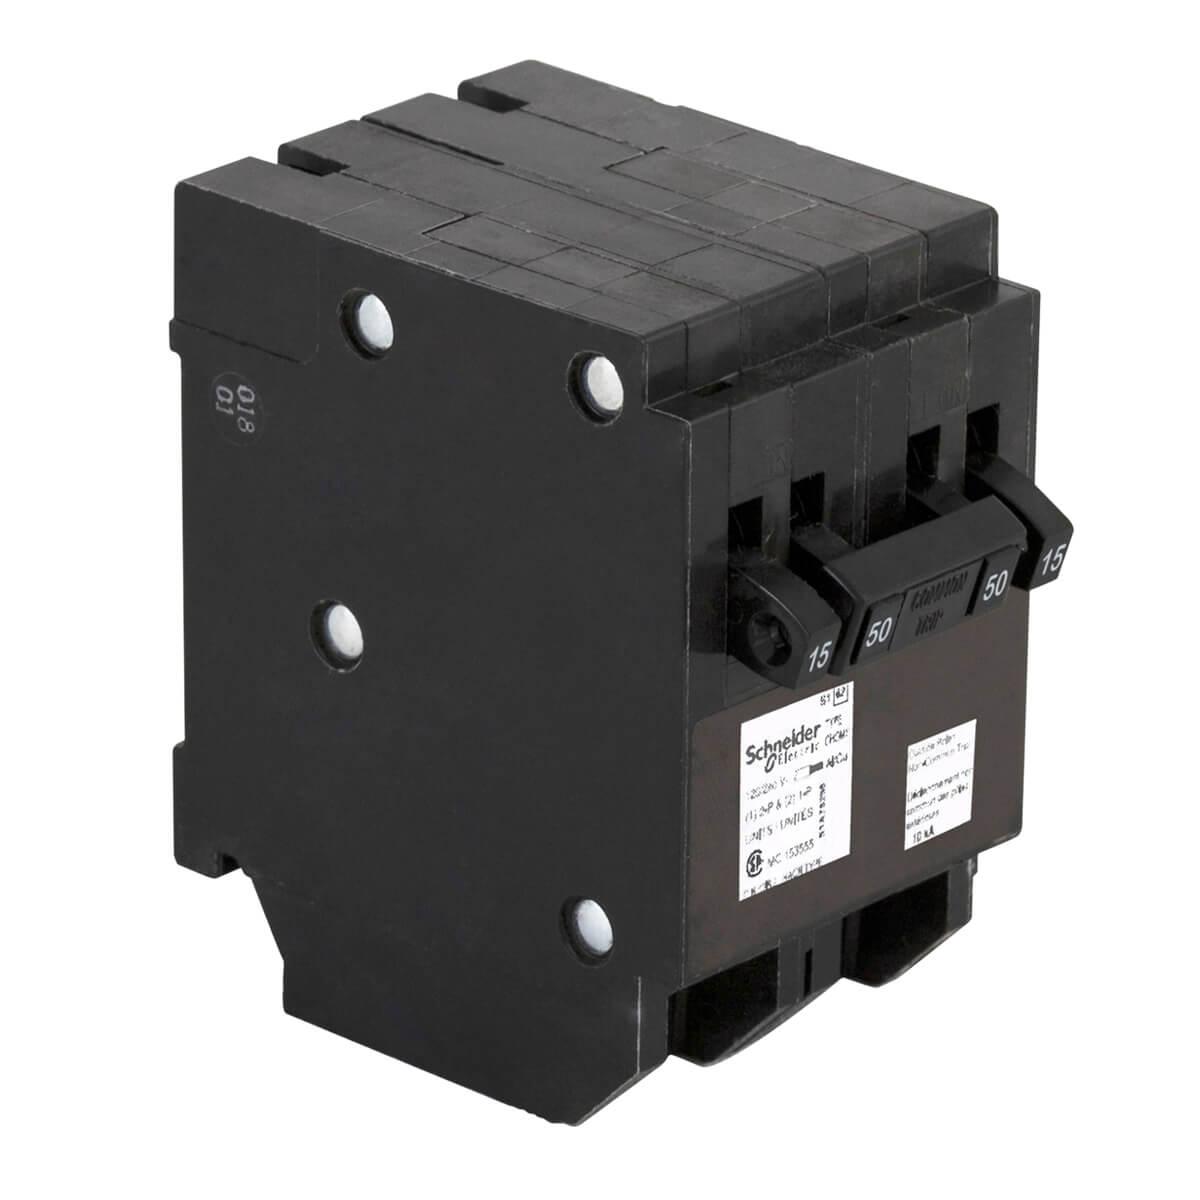 15A Single Pole x2 / 50A Double Pole Quad Plug-On Circuit Breaker